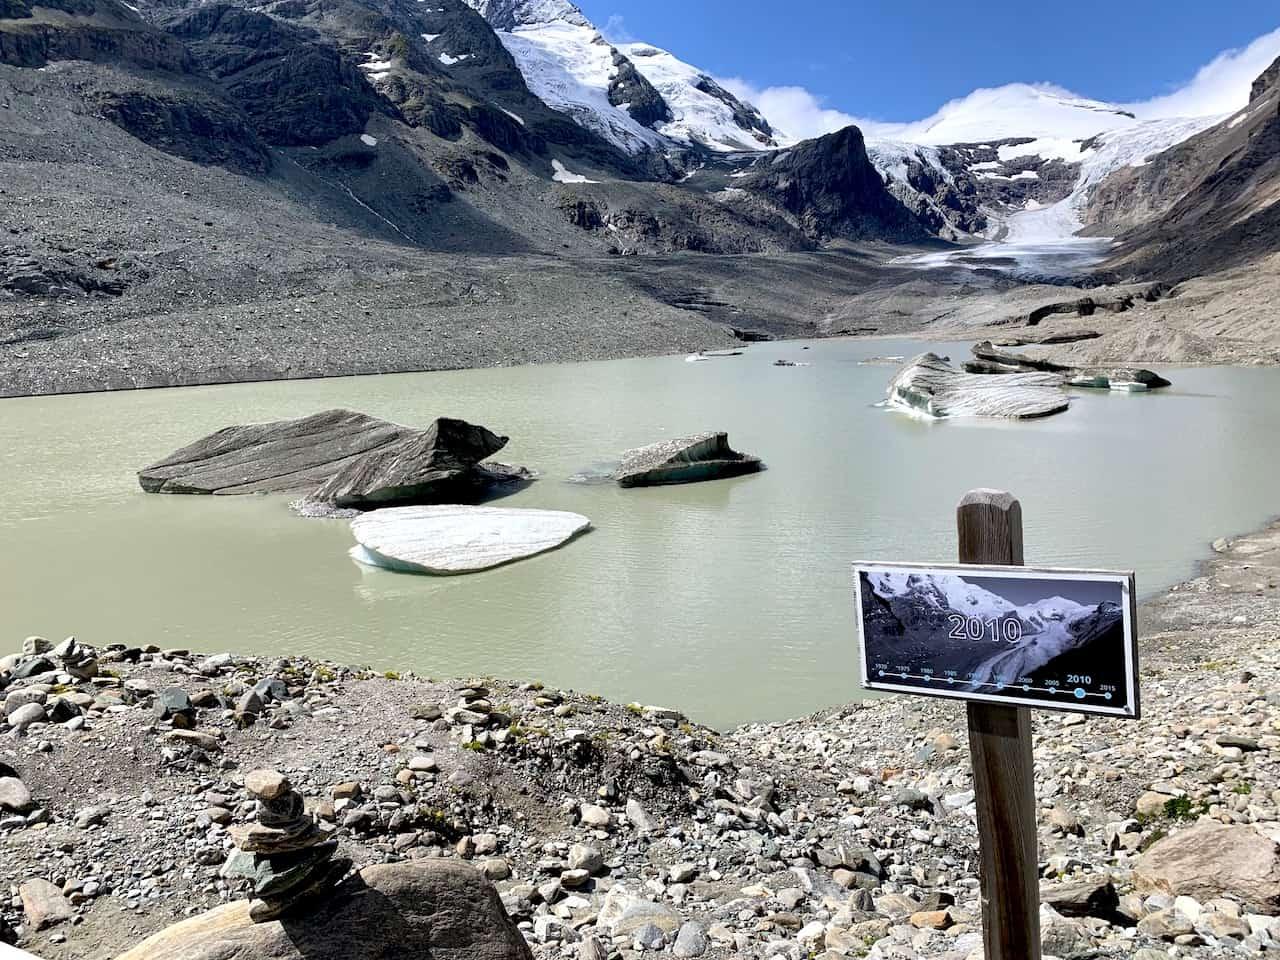 Pasterze Glacier Hiking Trail Sign